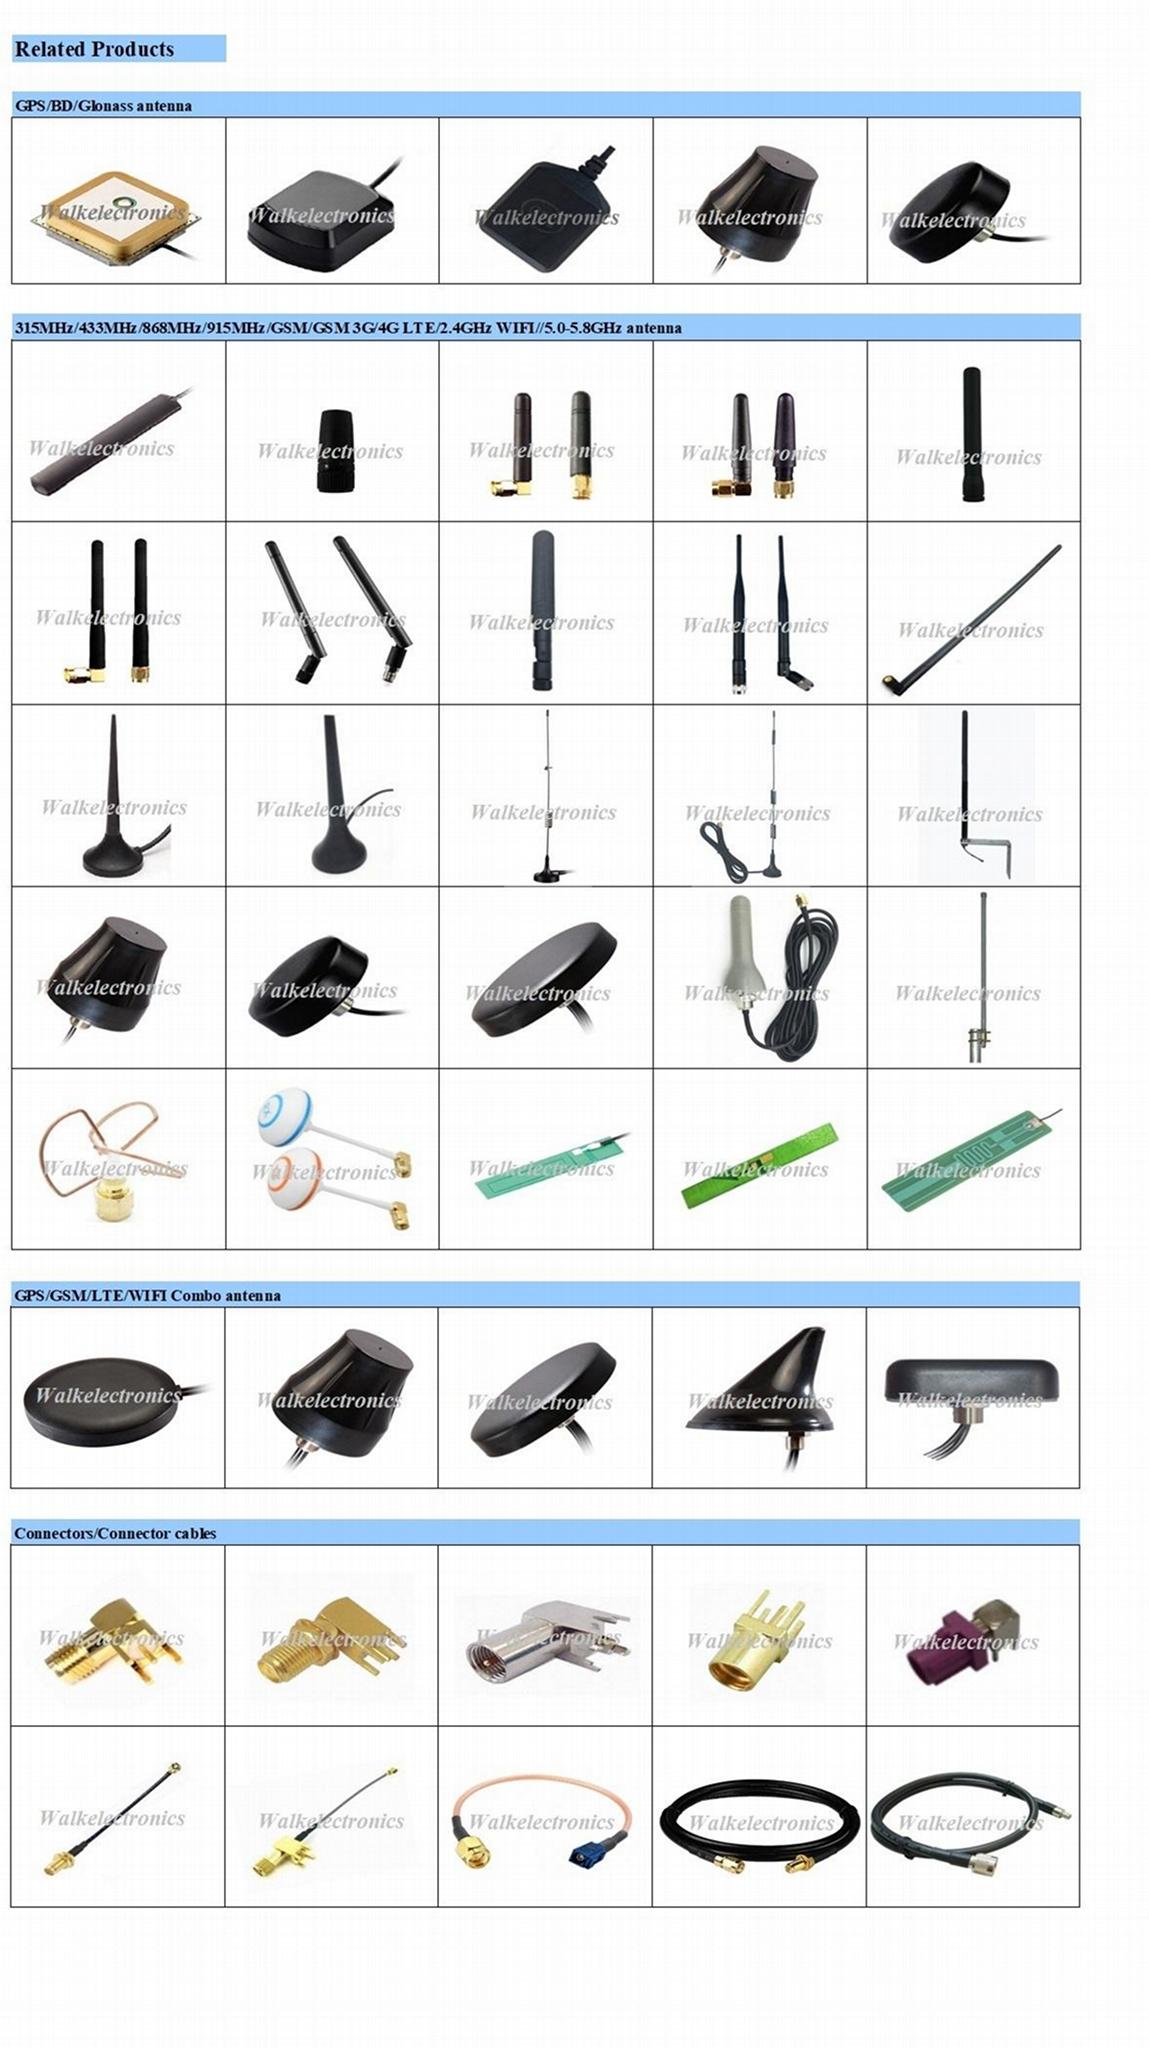 230mm length 7.0dBi high gain BNC male straight foldable gsm gprs rubber antenna 3